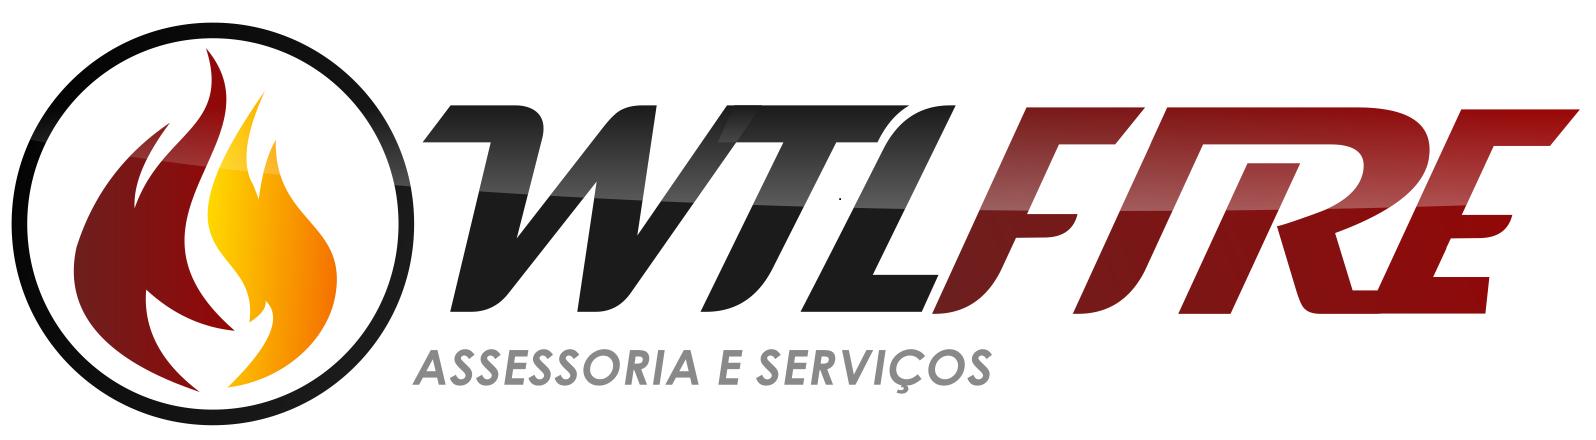 wtlfire.com.br